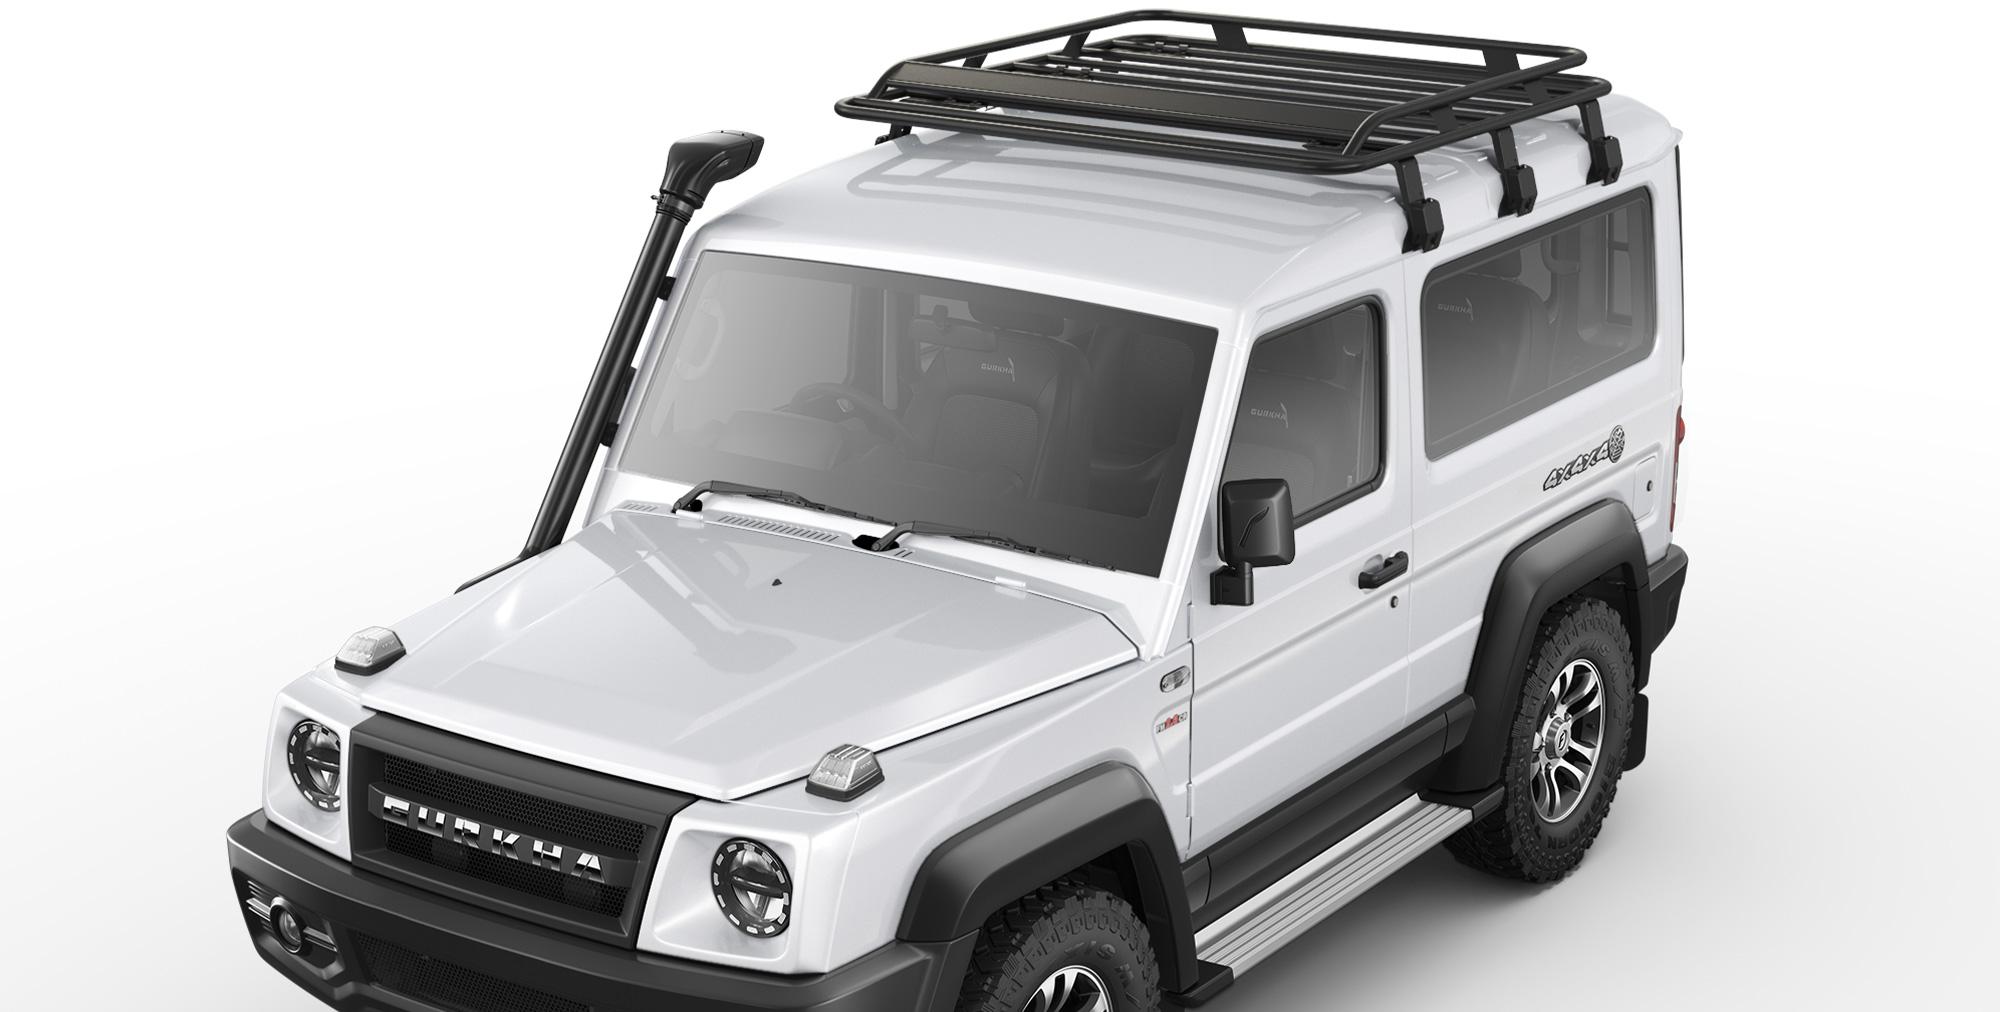 White Colour Gurkha 4x4x4 car with Roof Carrier